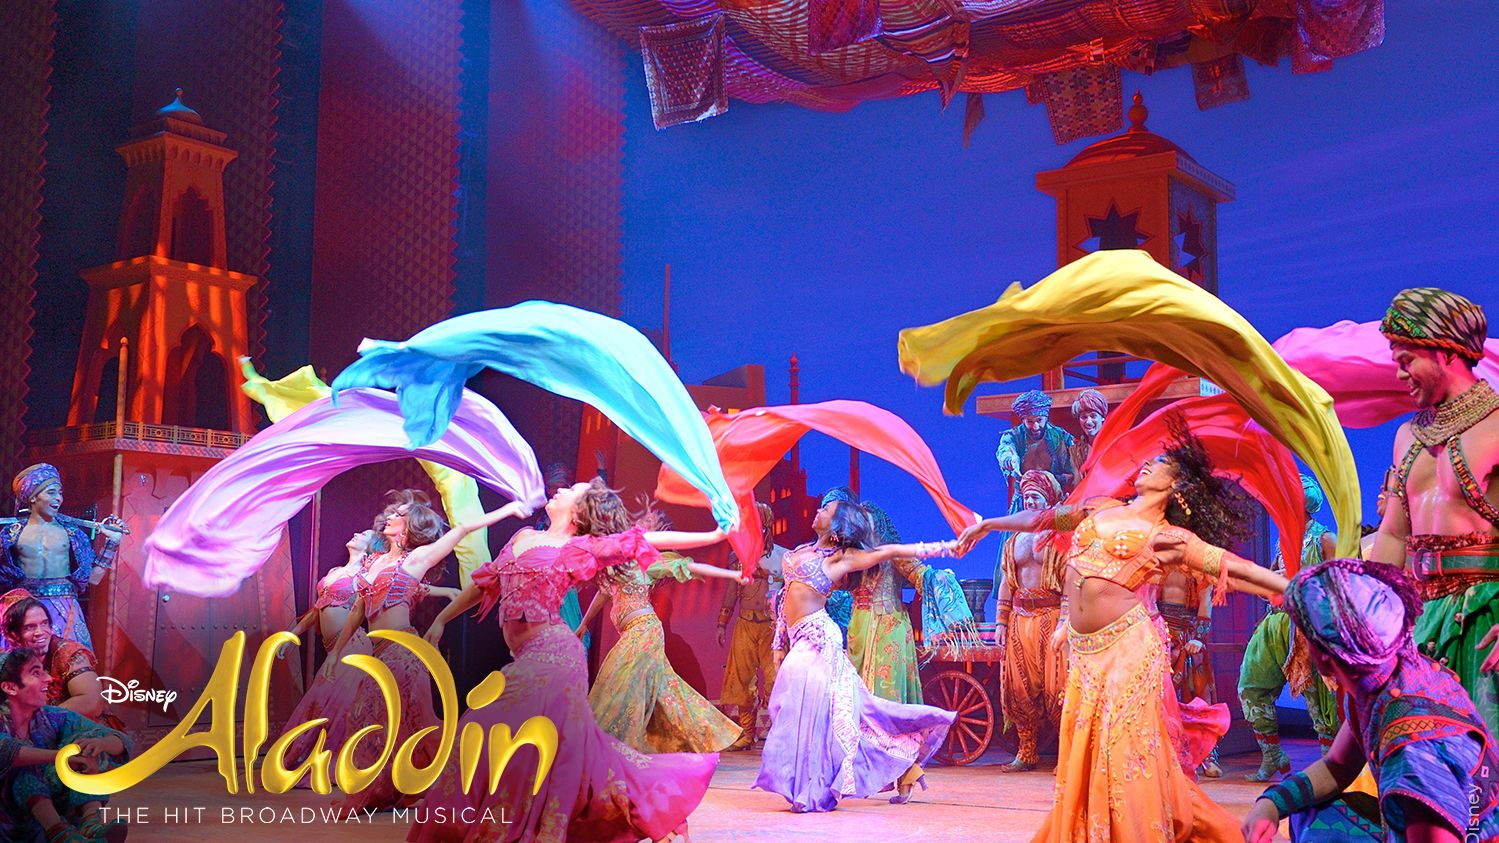 scene from Aladdin show in new york